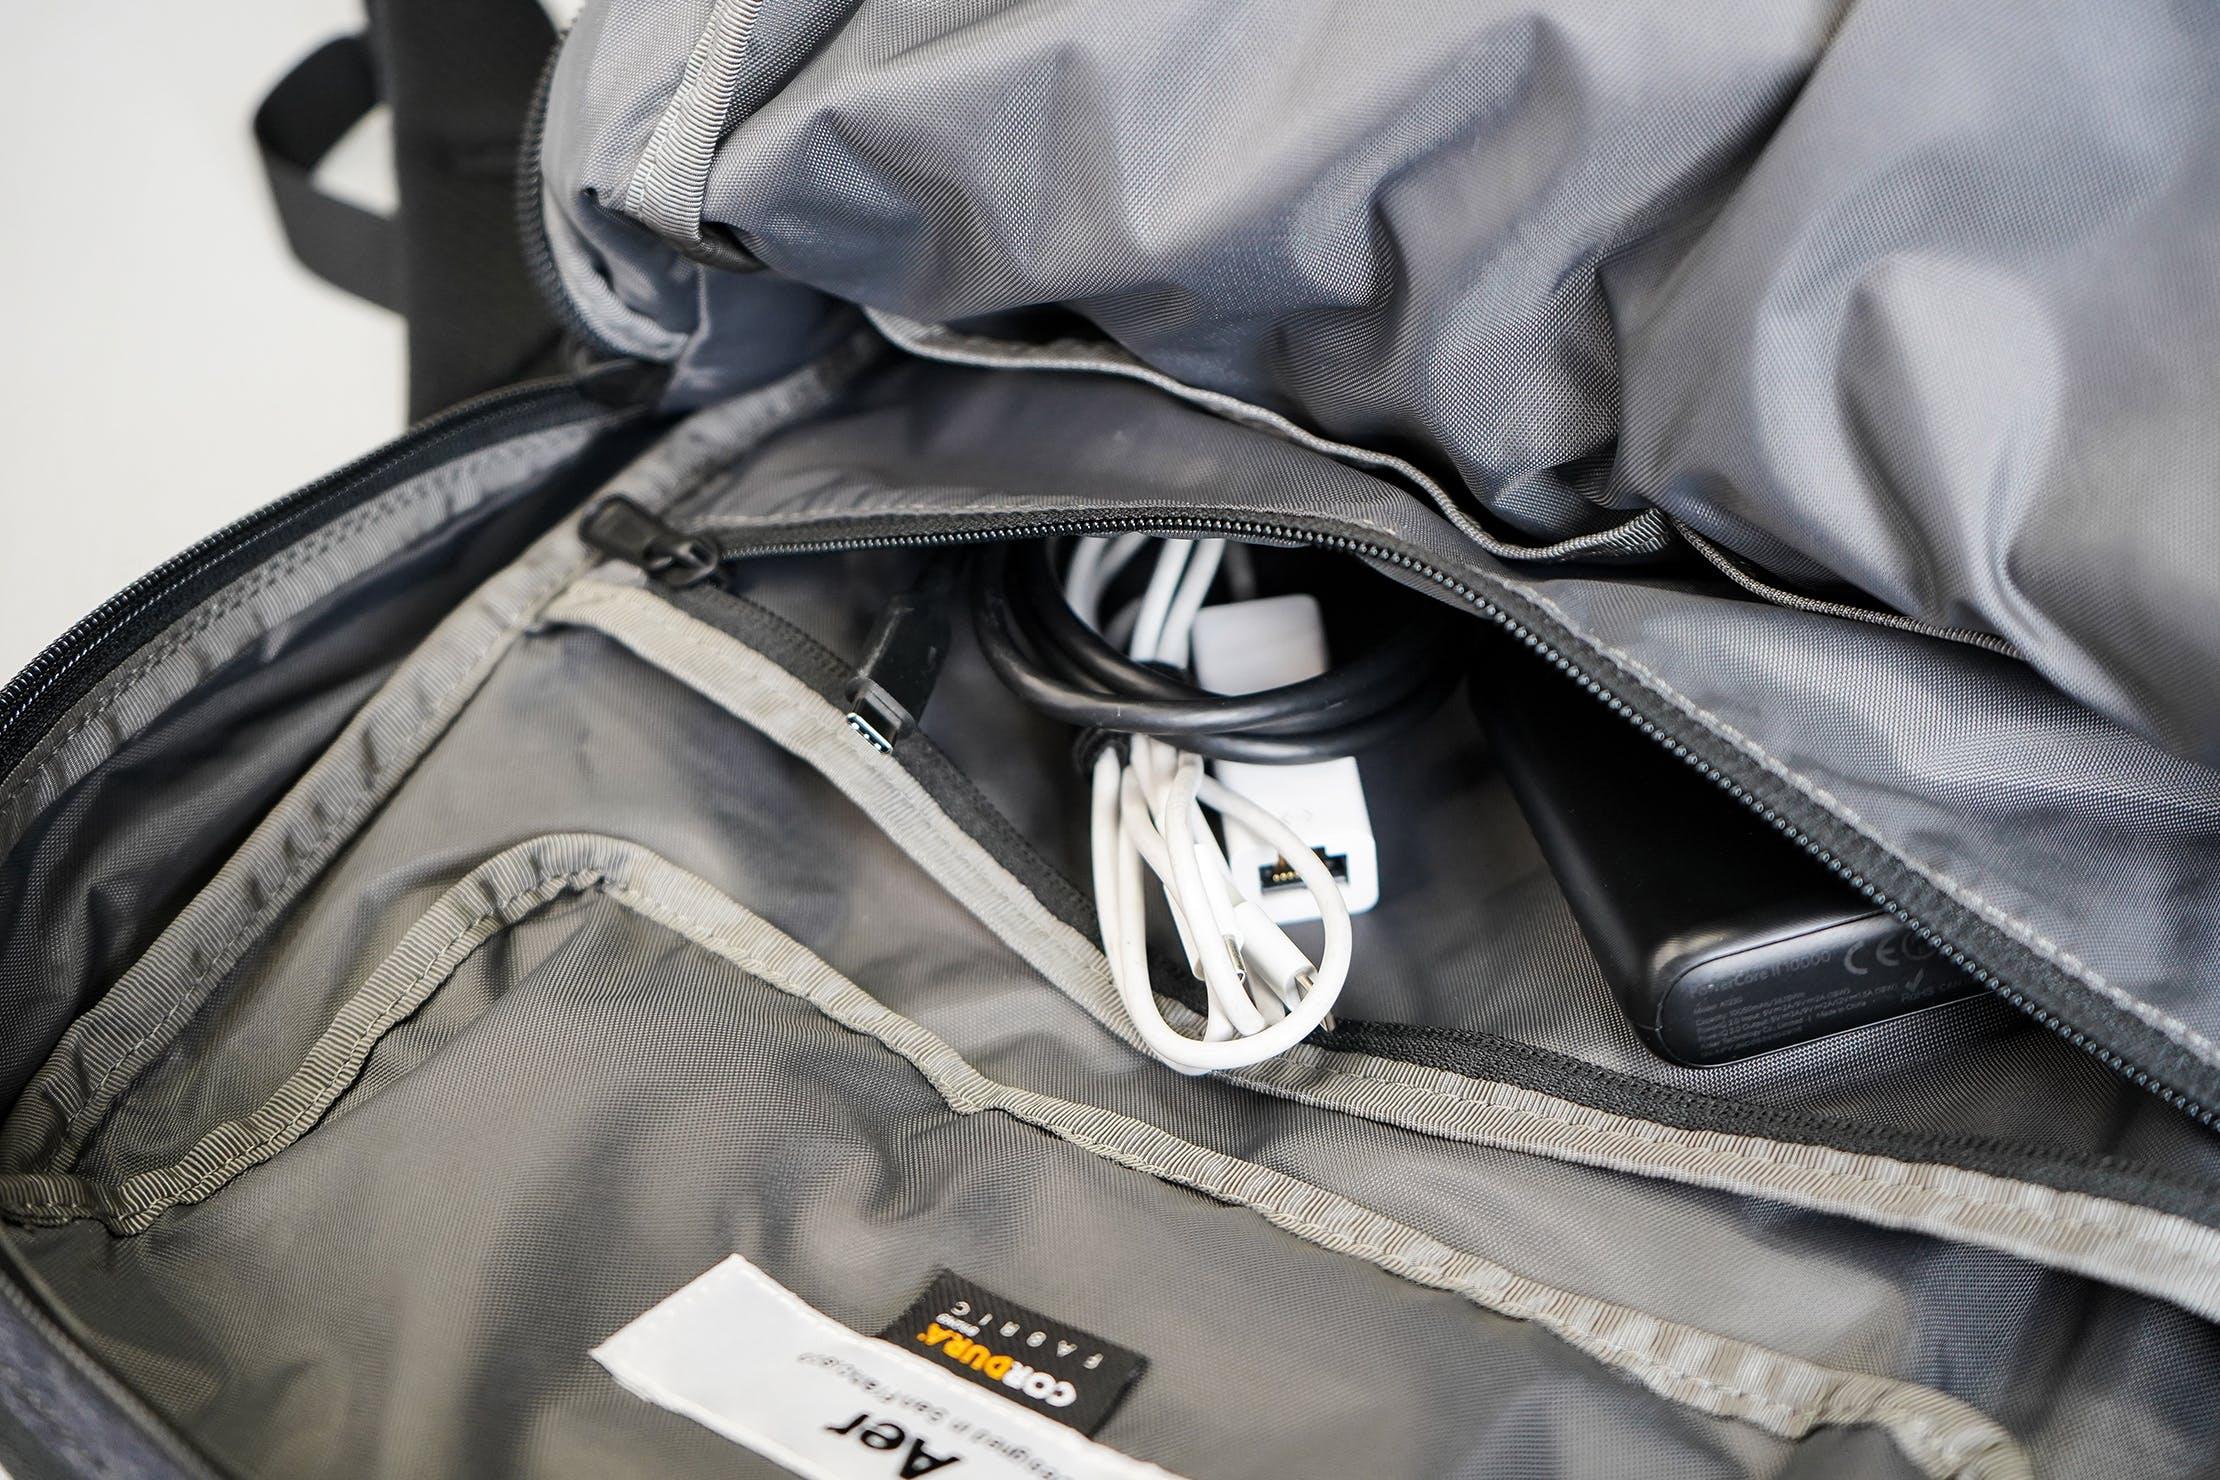 Aer Go Pack Internal Zippered Pocket